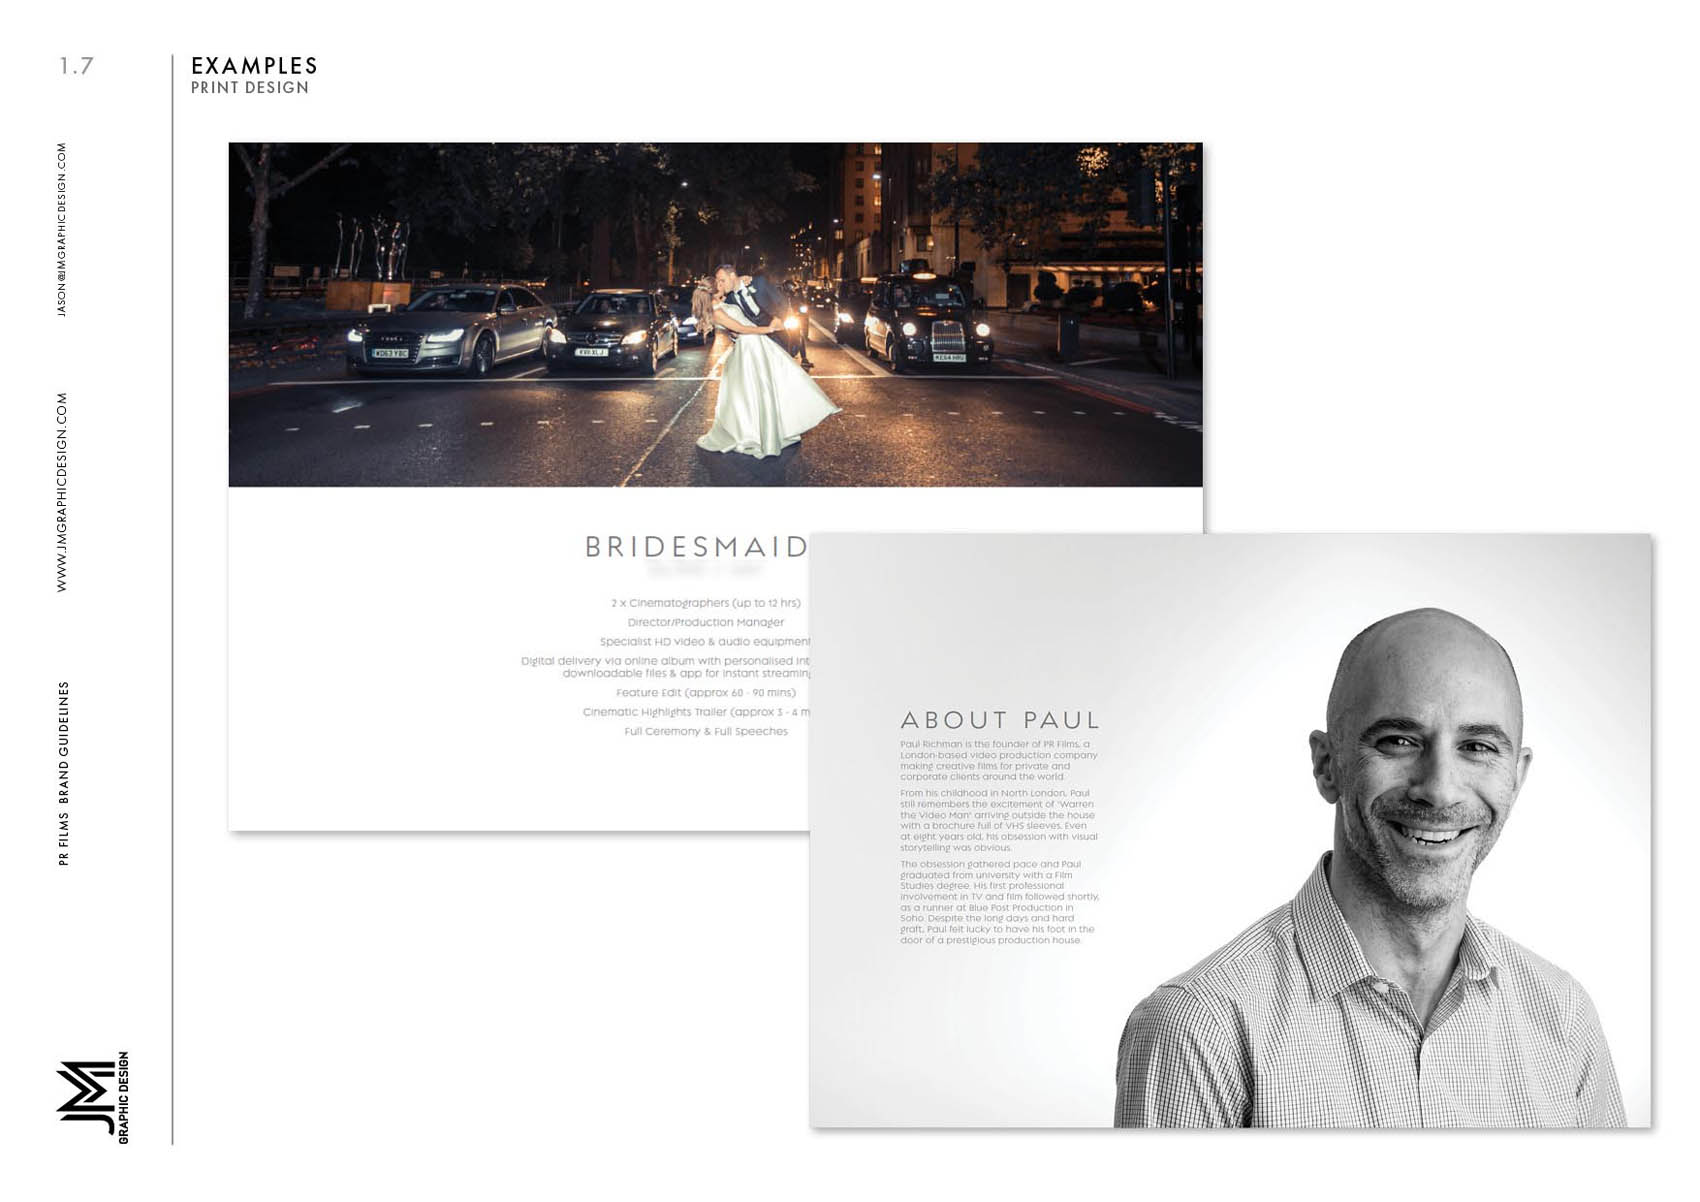 video-production-logo-website-design-london04